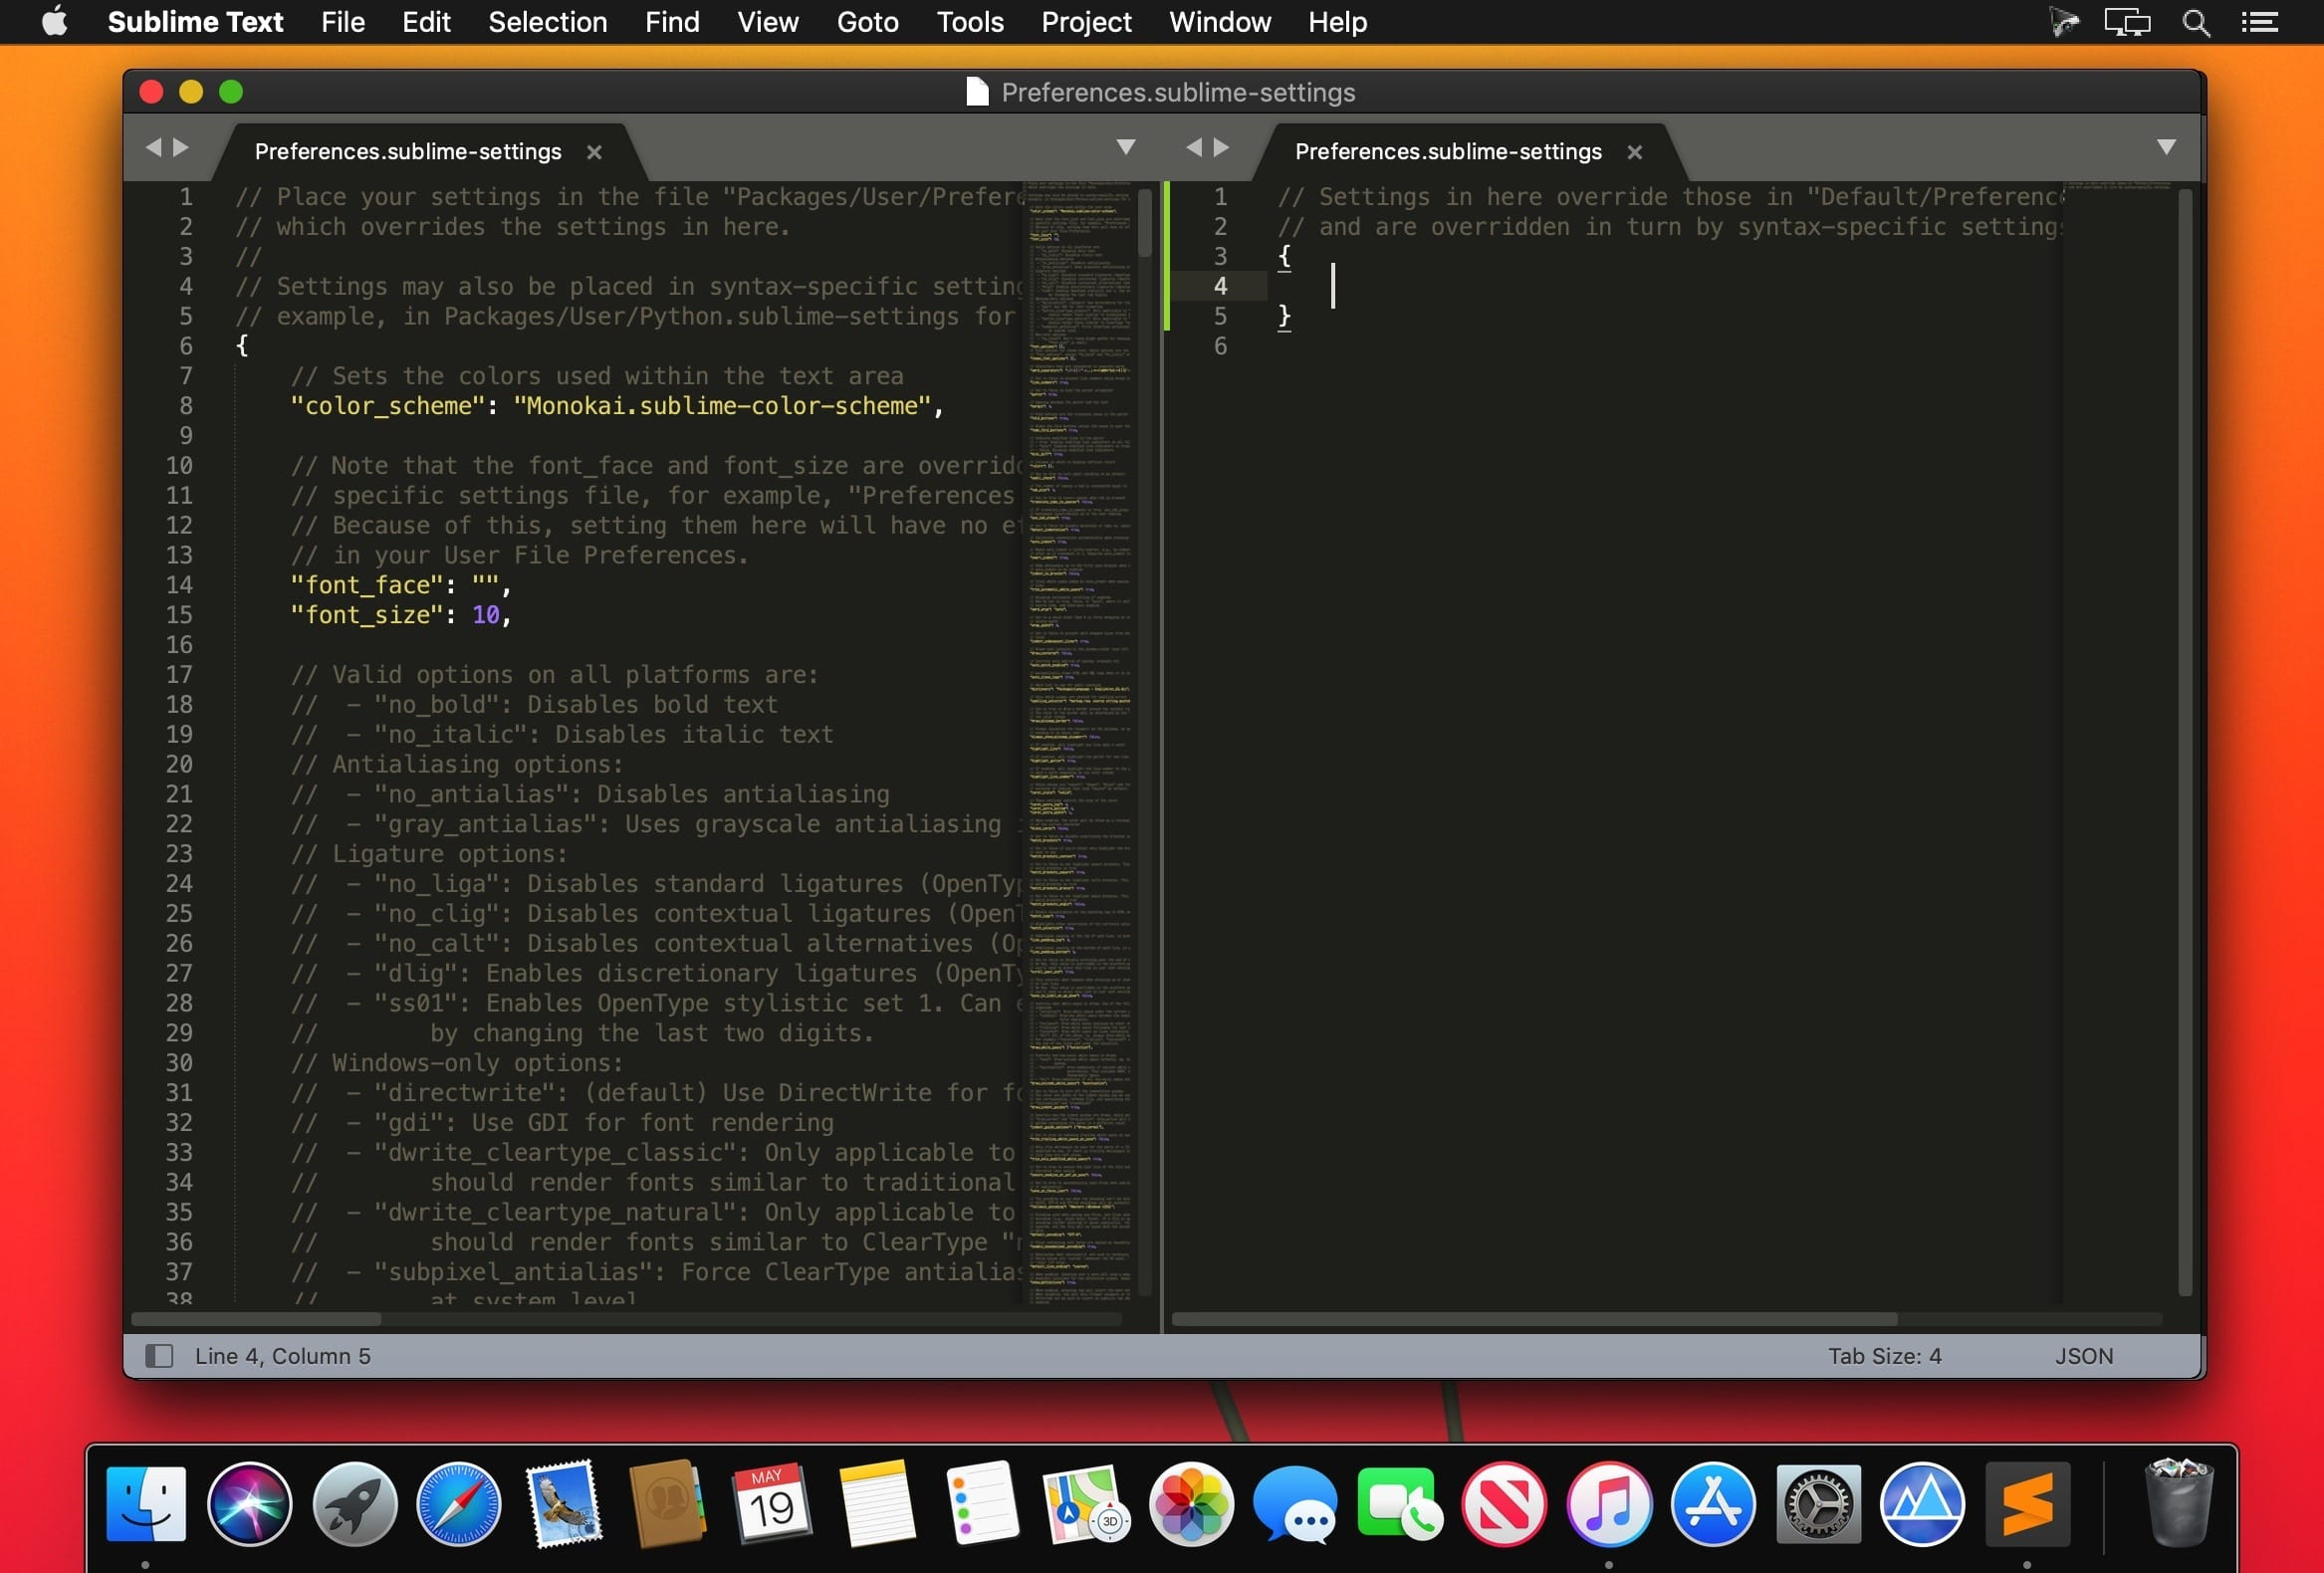 Sublime Text Mac